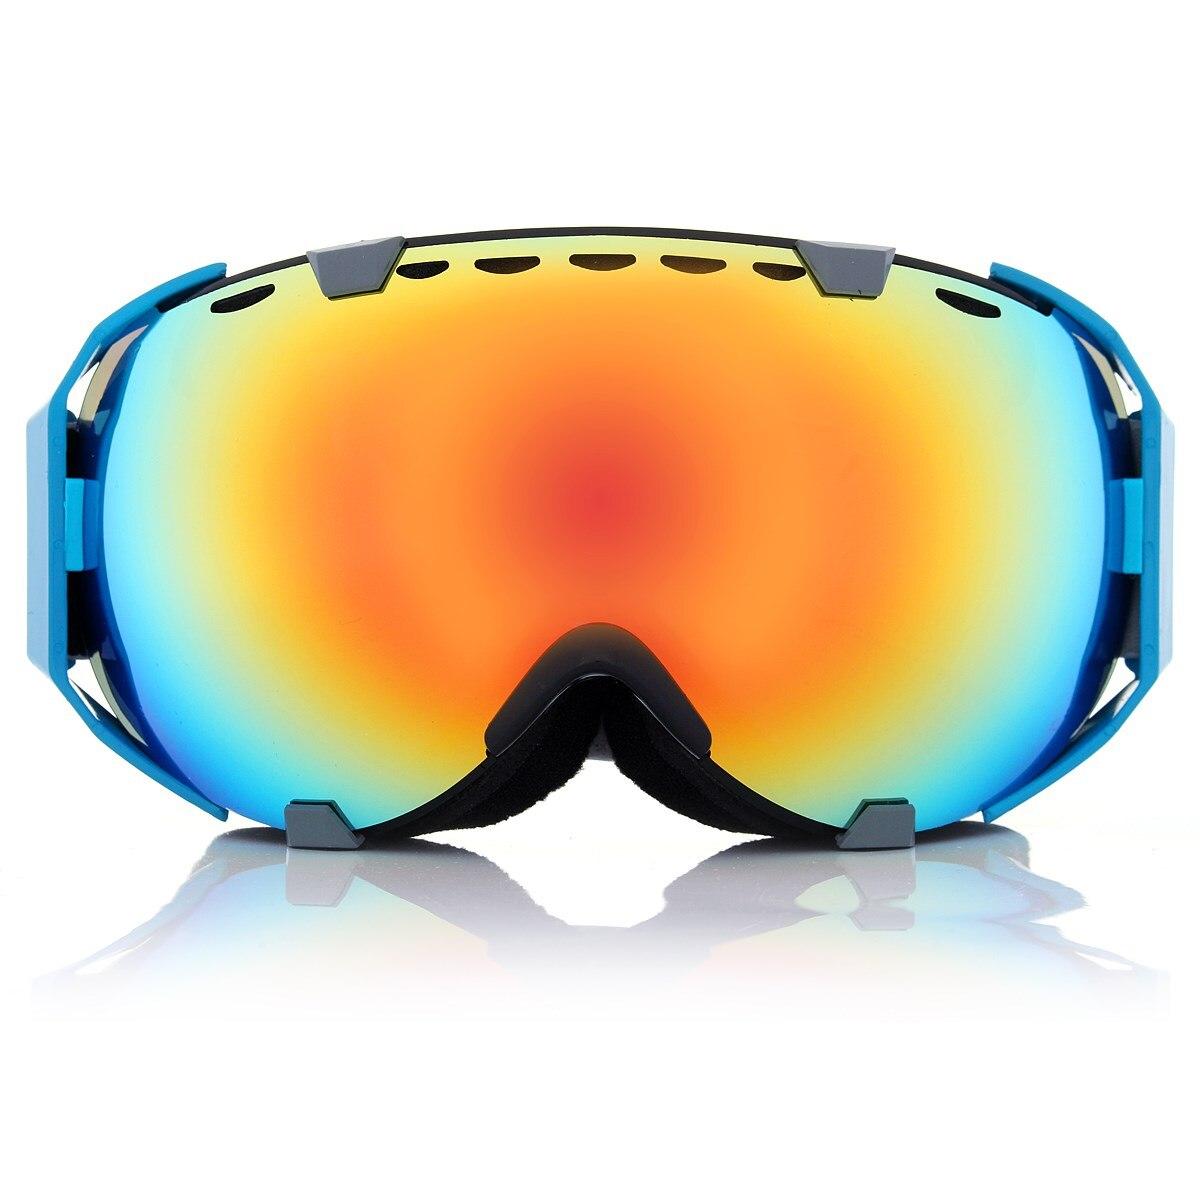 11 colors Unisex Professional Spherical Dual Lens Mirror anti fog UV Snowboard ski goggles Skiing Eyewear glasses